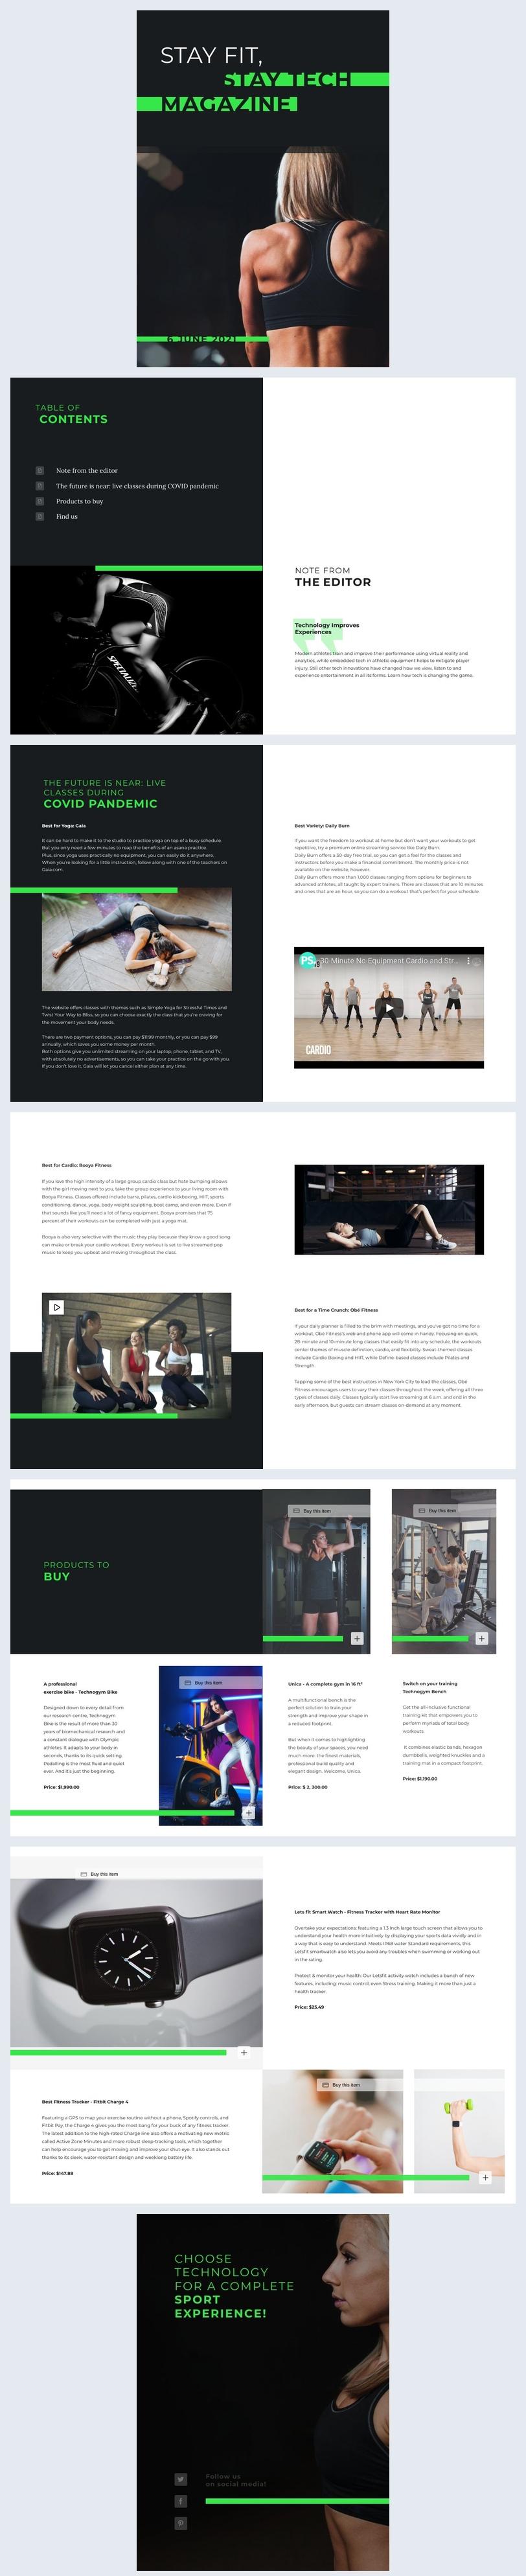 Interaktives Fitness-Tech-Magazin-Design